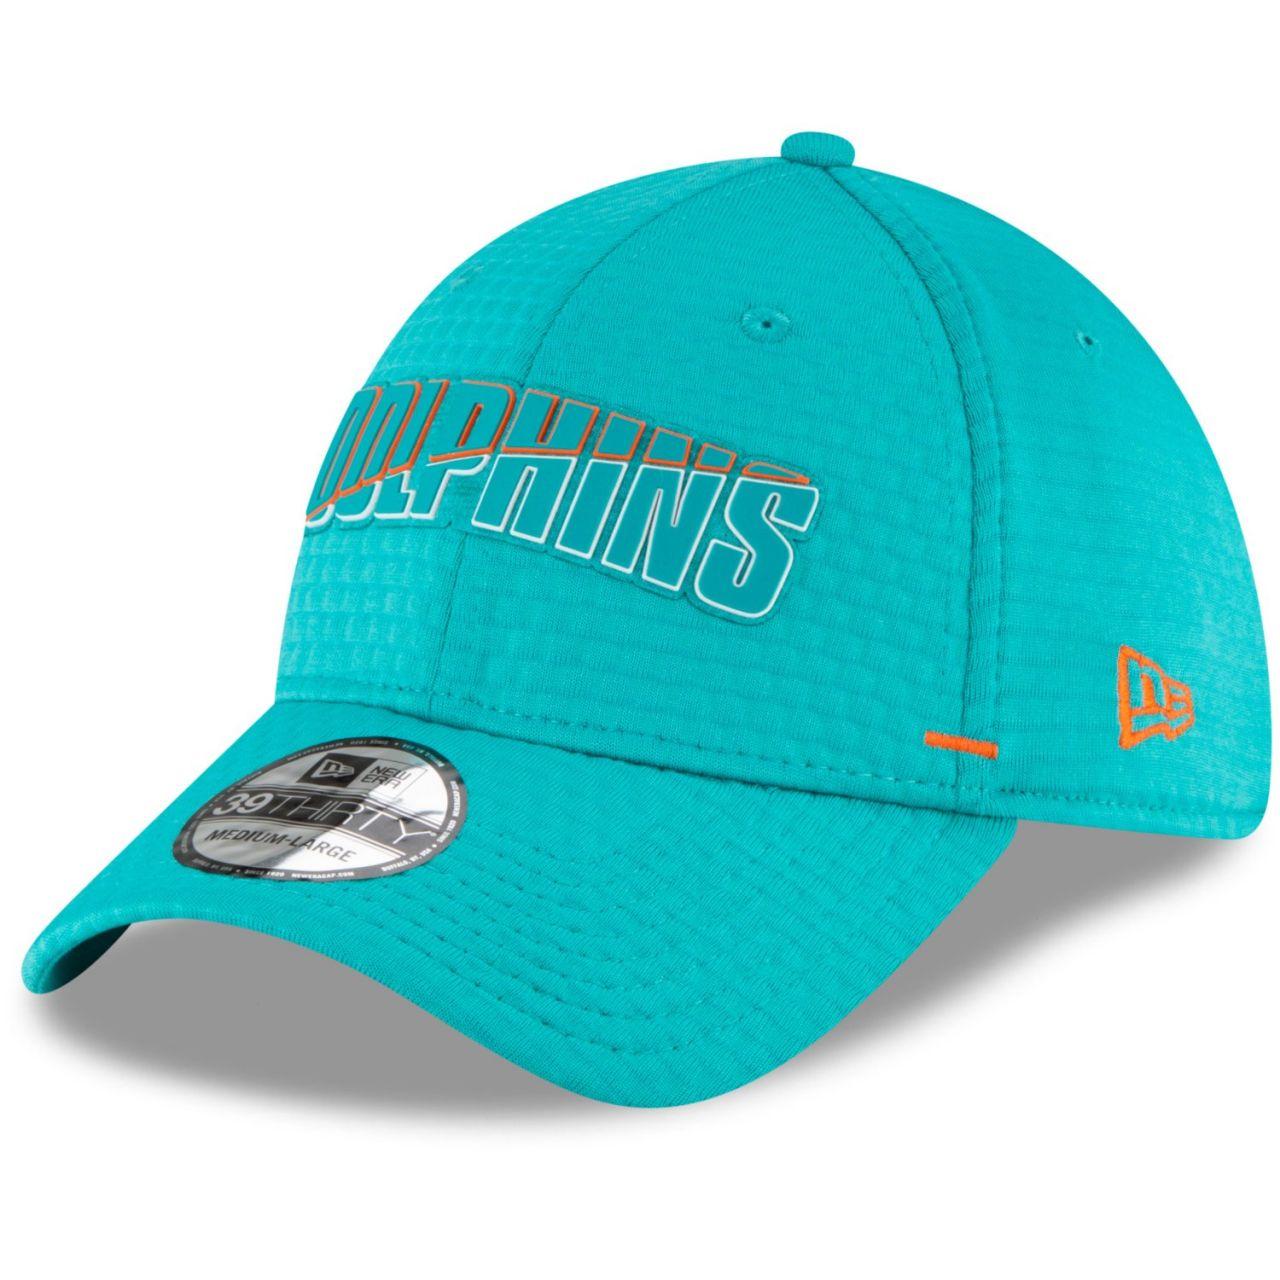 amfoo - New Era 39Thirty Cap - NFL Training Camp Miami Dolphins